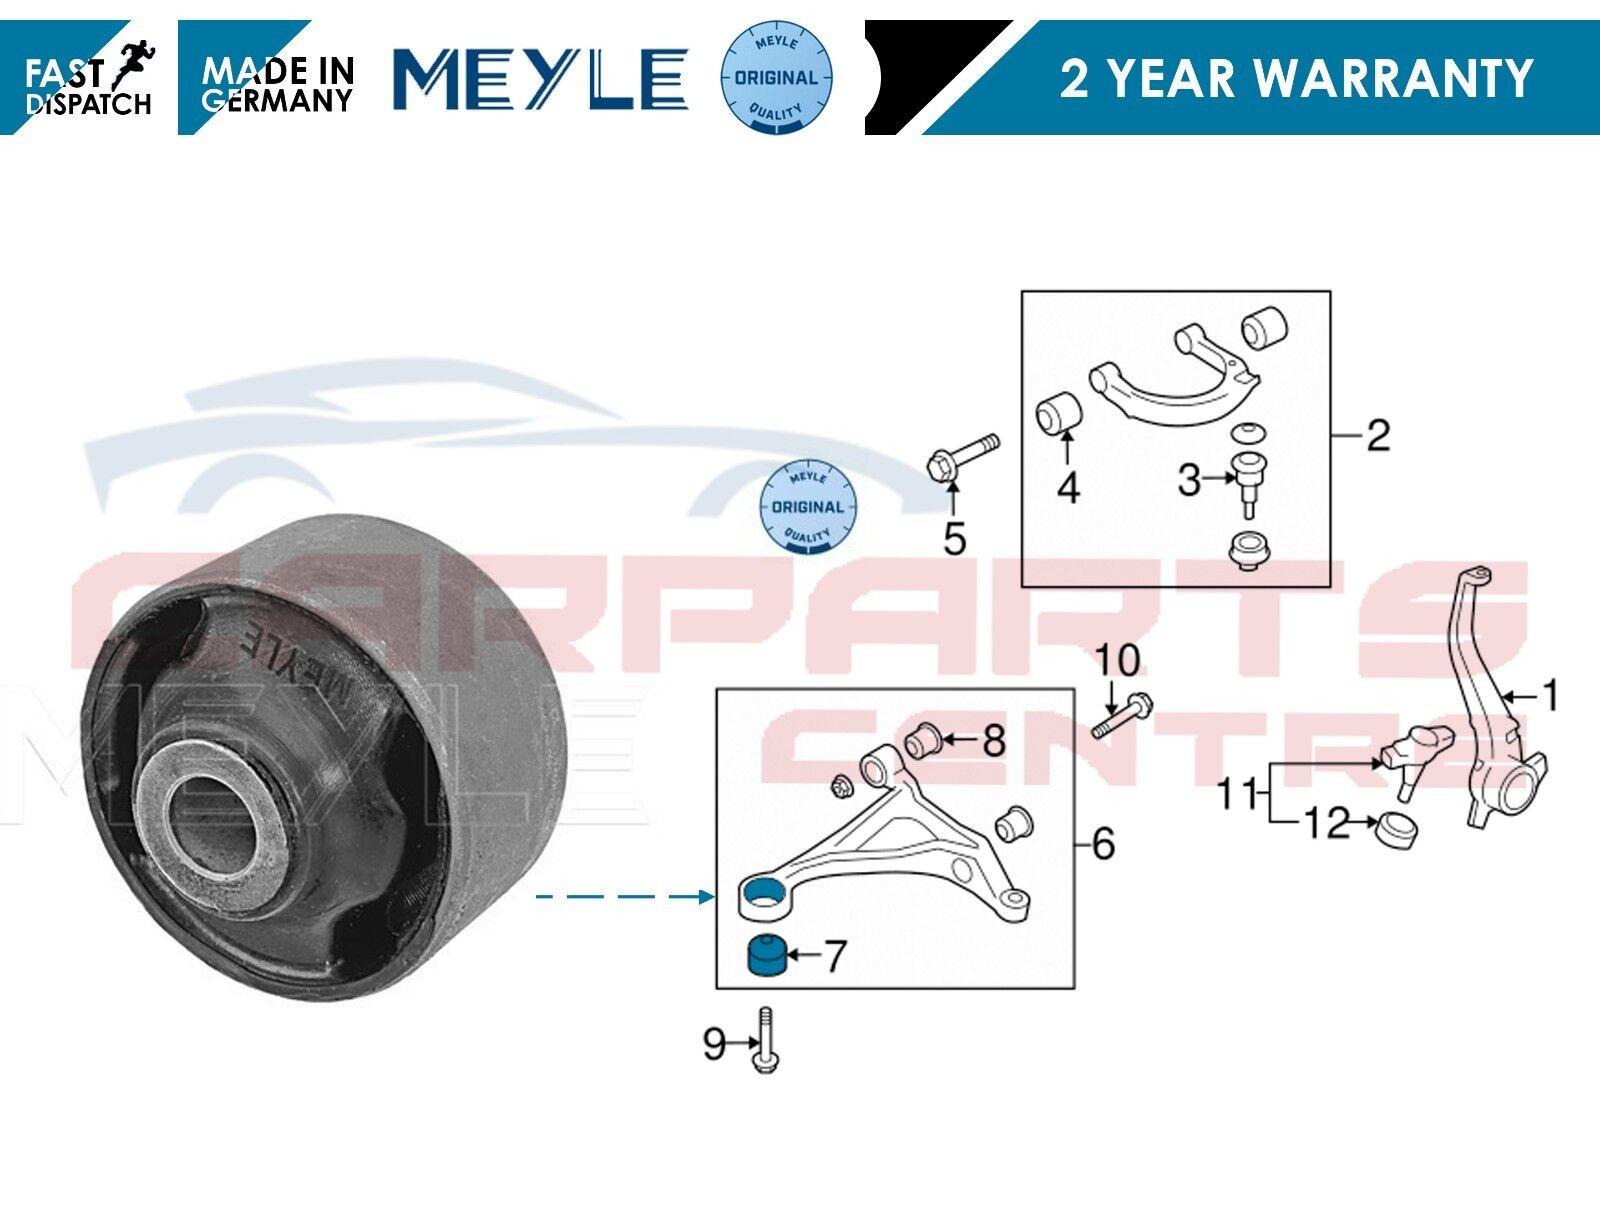 FOR HONDA HR-V 98-05 FRONT LOWER WISHBONE TRACK CONTROL ARM REAR BUSH